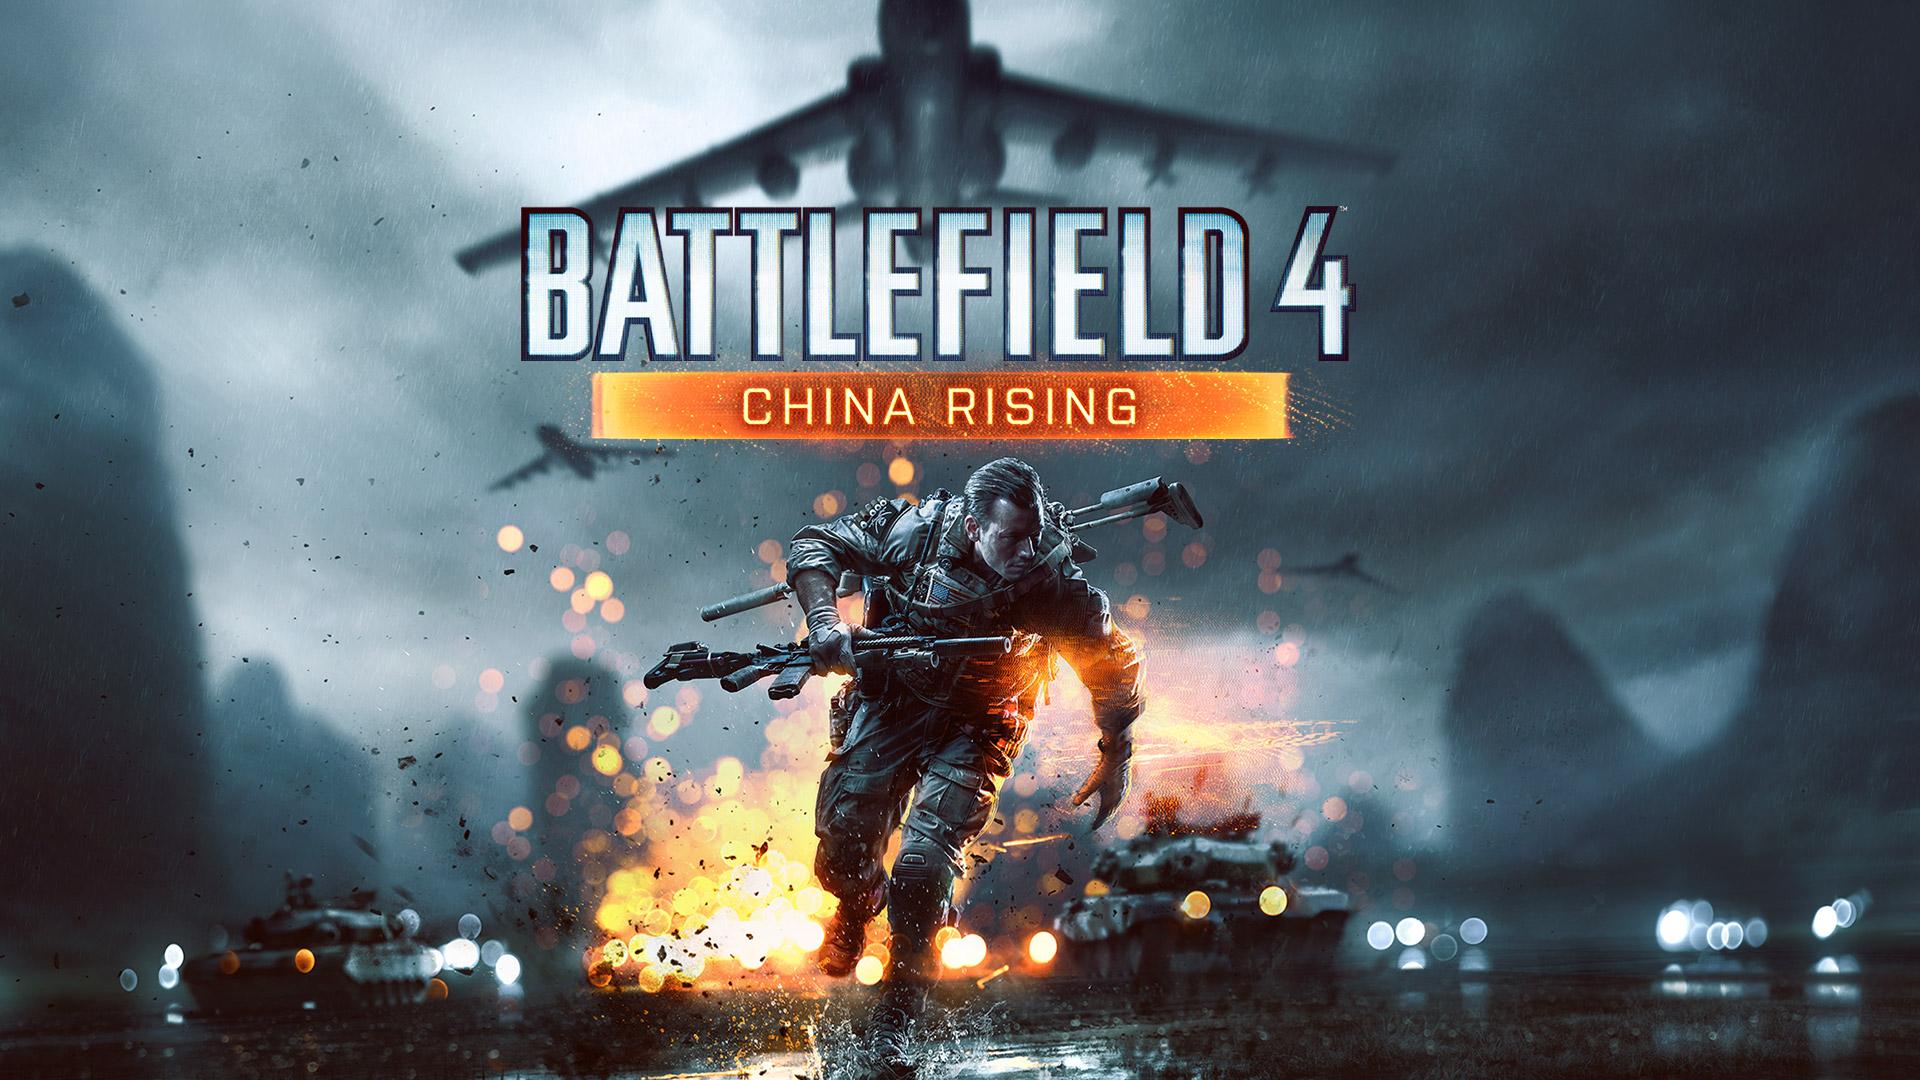 HQ Battlefield 4 Wallpapers   File 524.34Kb